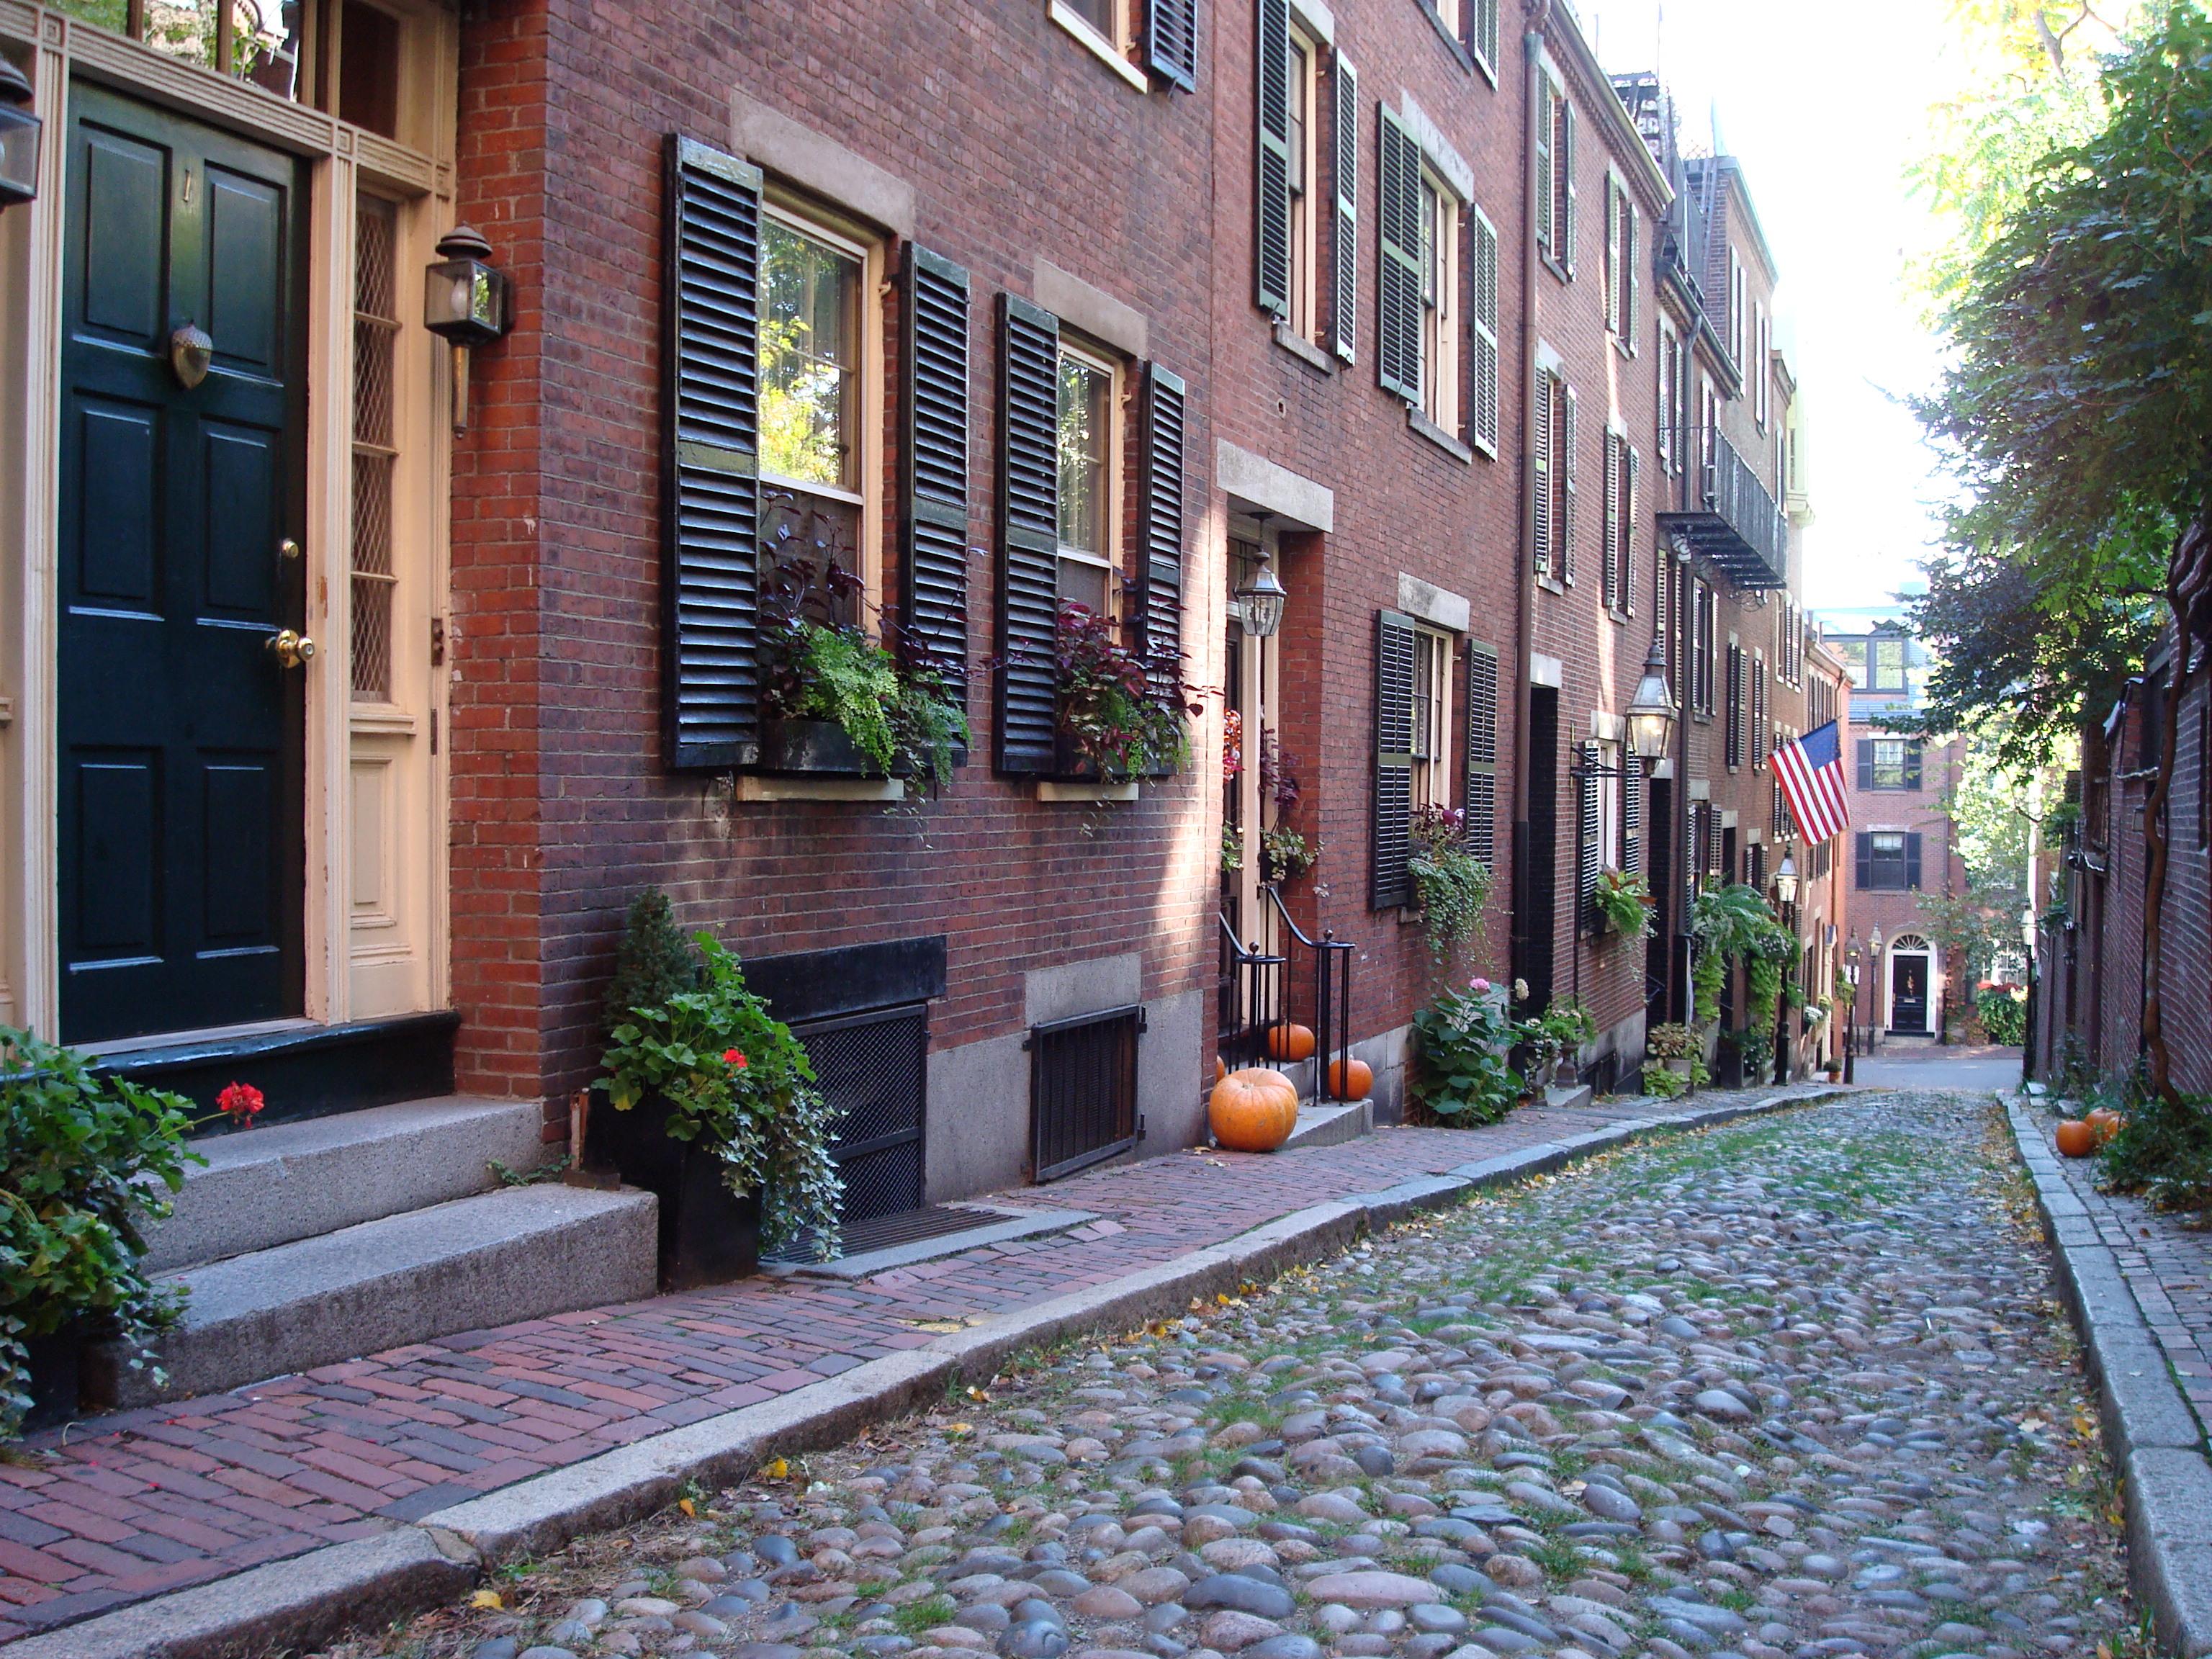 Beacon Hill in Boston. Photo by Darron Schall.